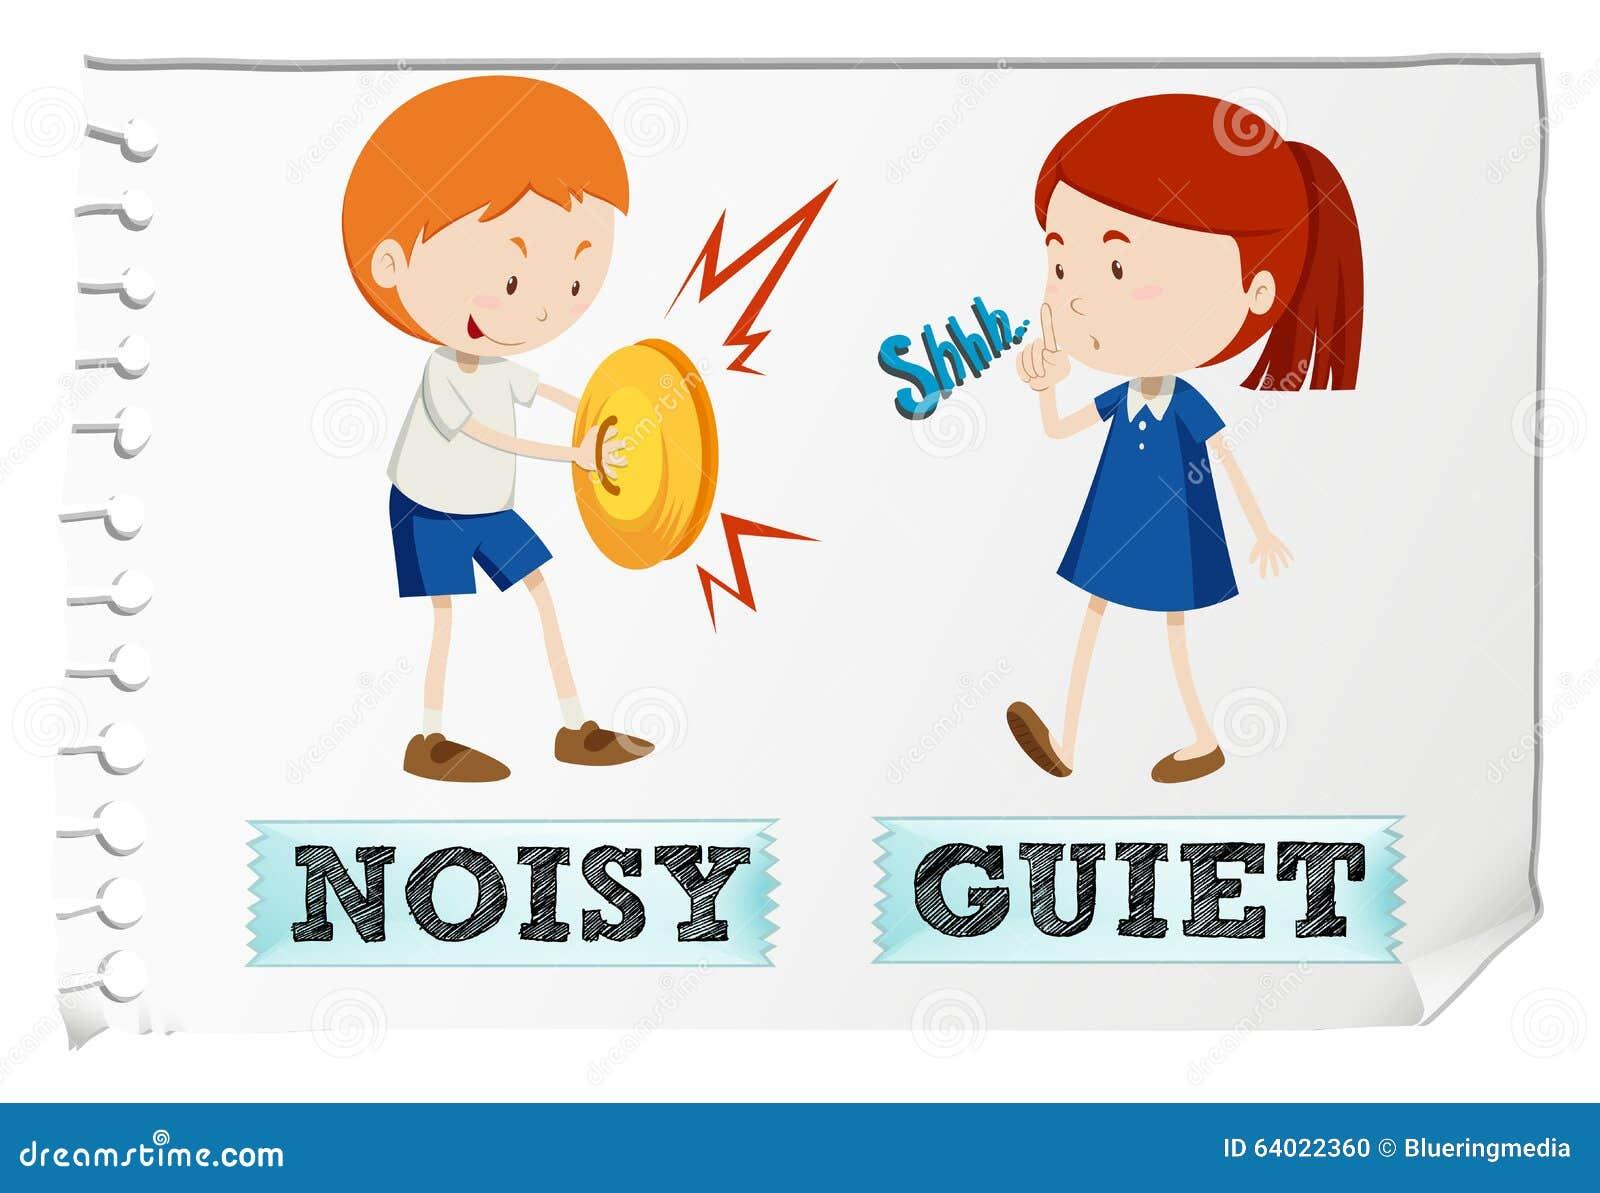 Stock Illustration Opposite Adjectives Noisy Quiet Illustration Image64022360 on Opposites Flashcards